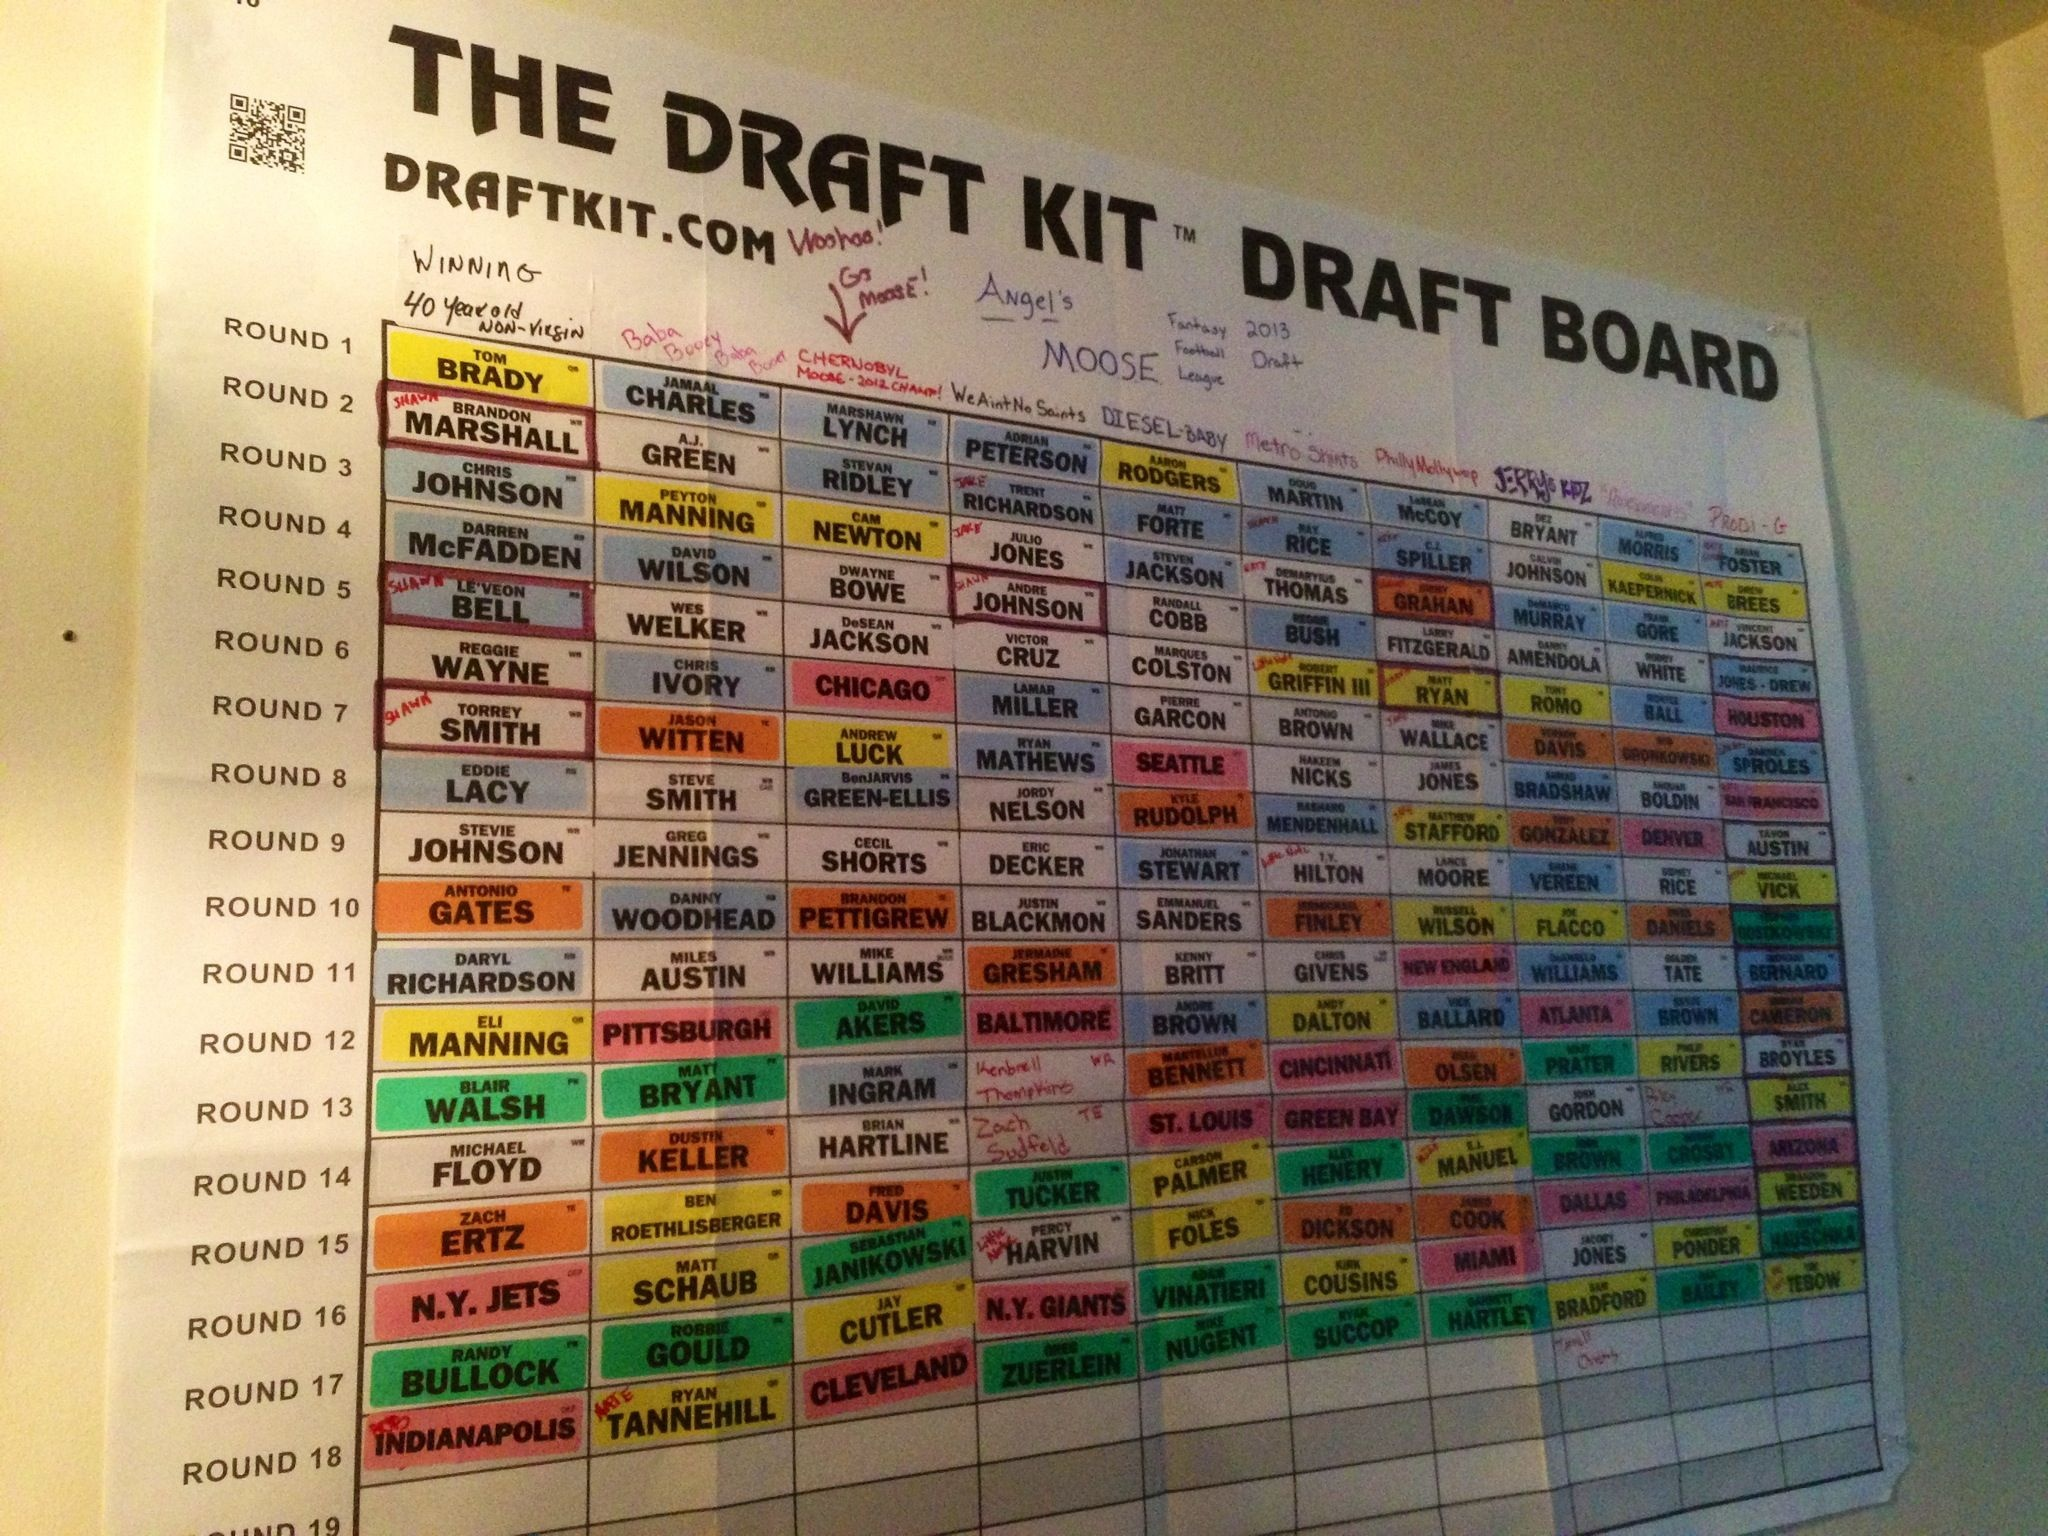 Fantasy Football Draft Board   Cool Stuff!   Draft Fantasy Football - Free Fantasy Football Draft Kit Printable